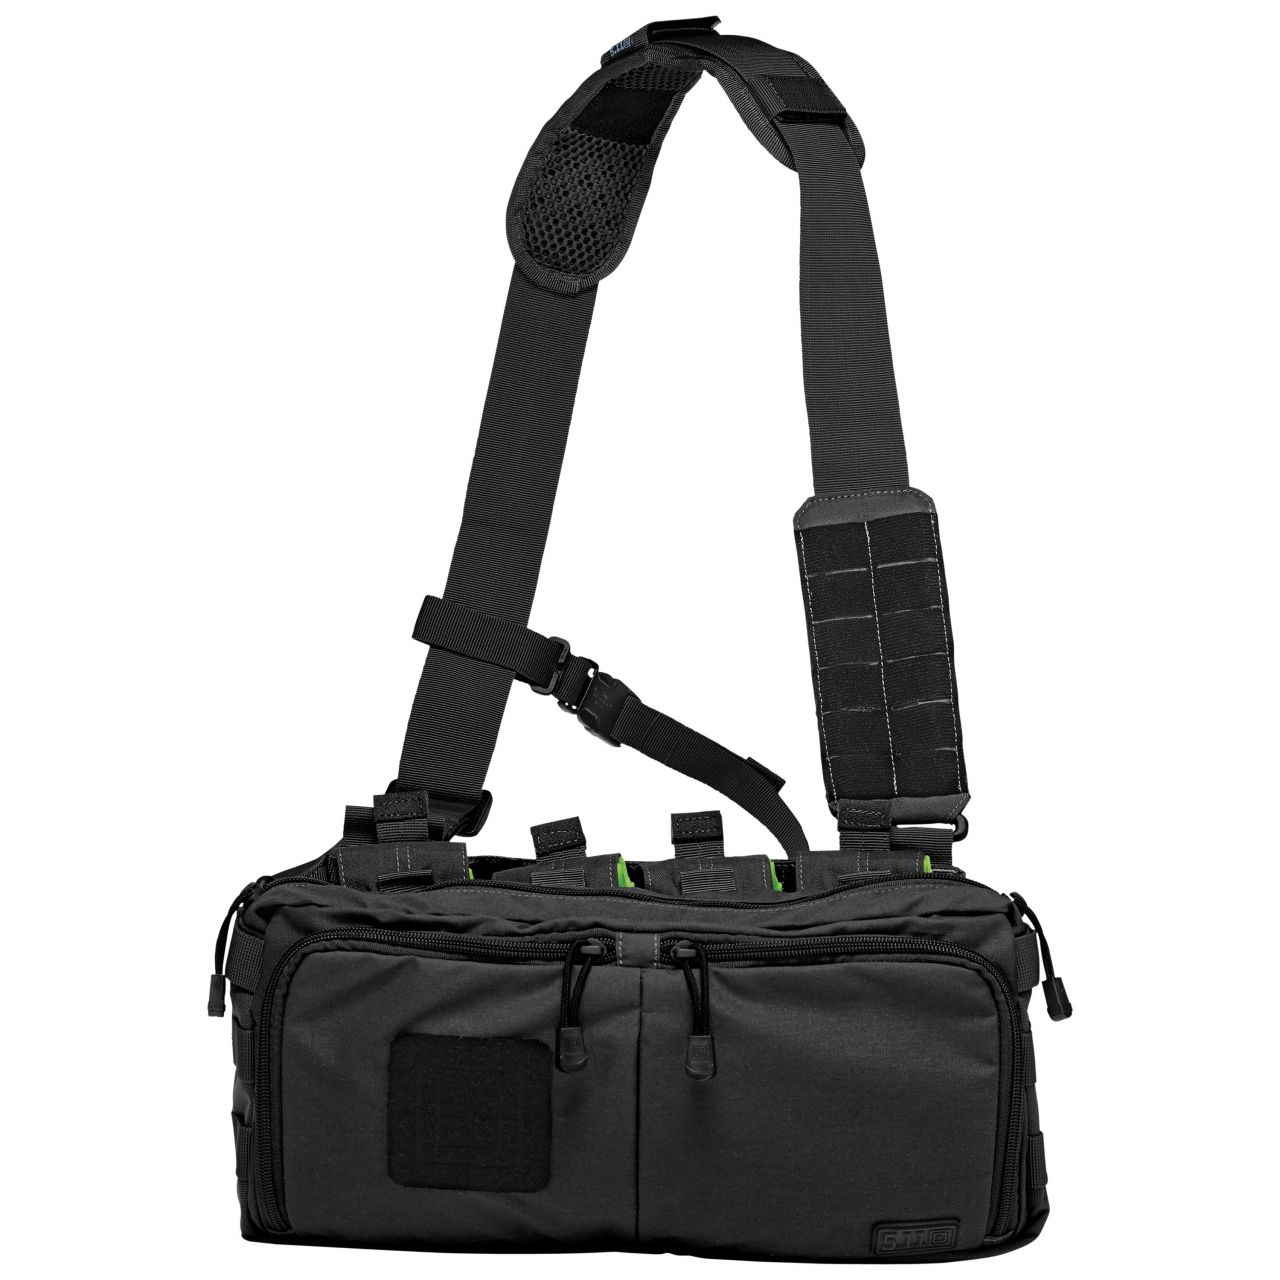 Bolsa 5.11 4-Banger Bag negra